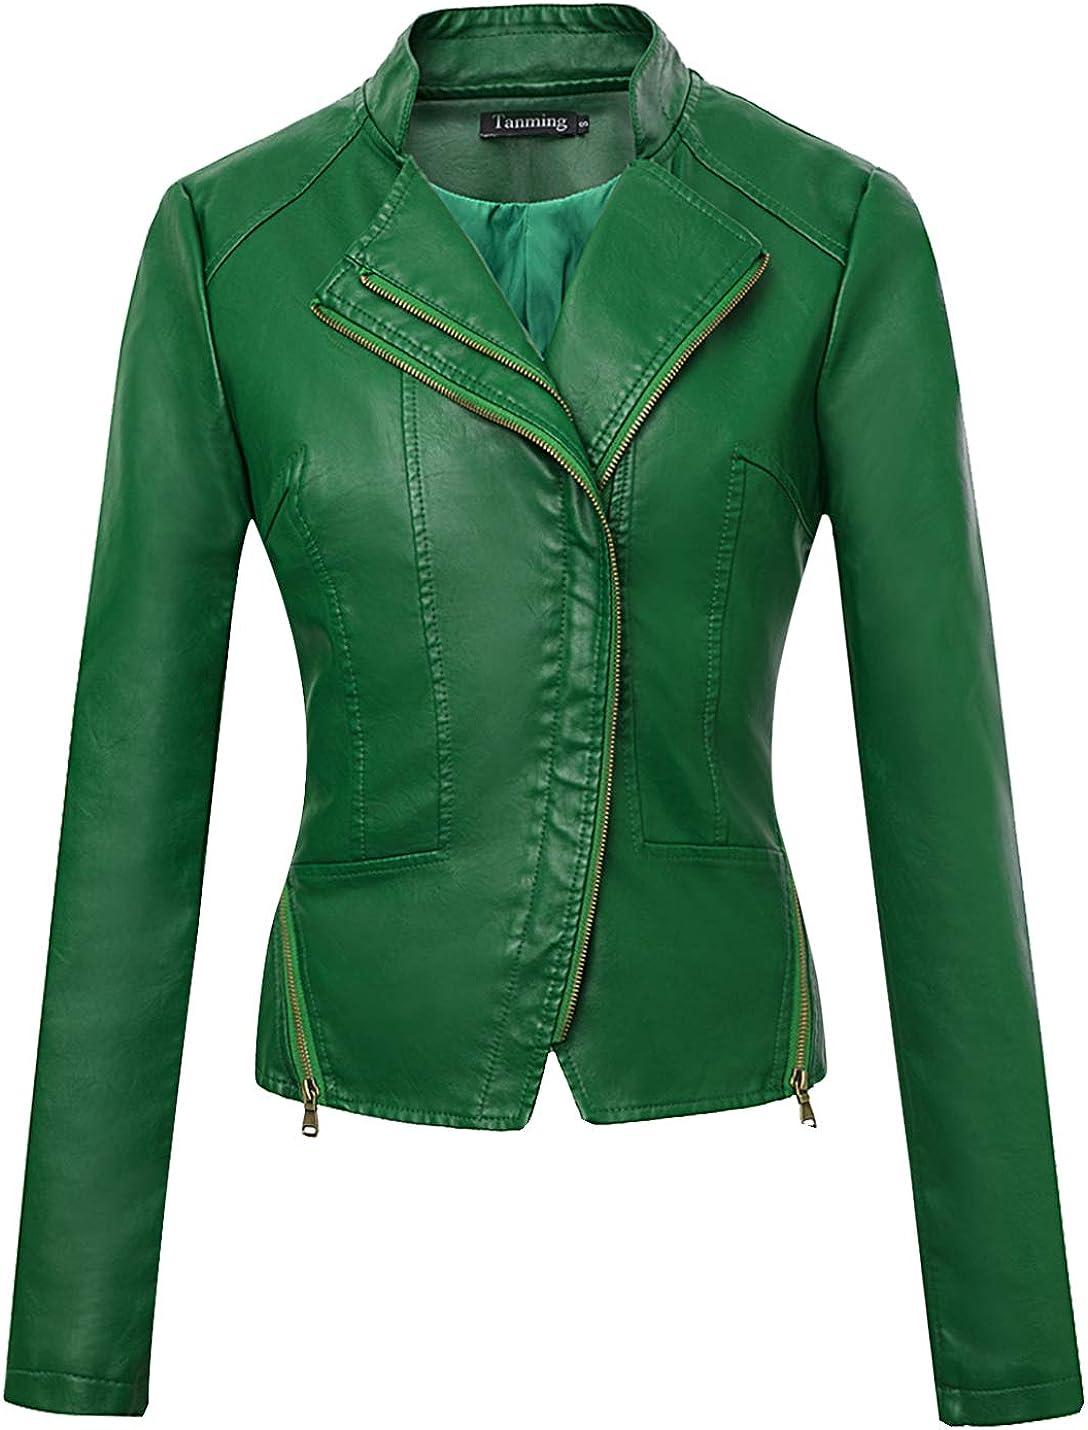 Tanming Women's Casual Moto Bomber Short PU Faux Leather Jacket Coat Outwear